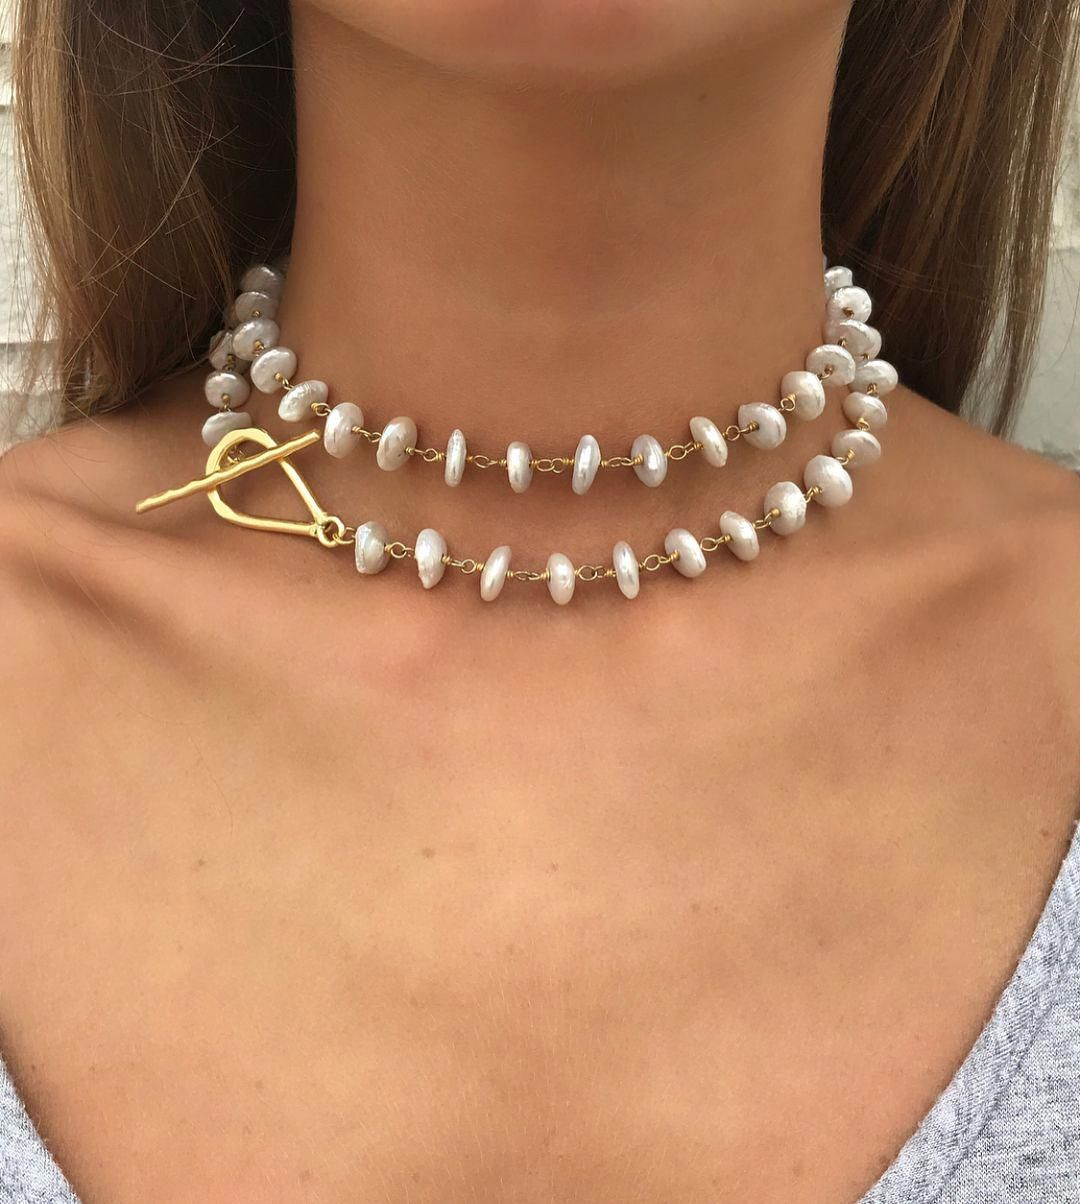 Lisajilljewelry This Pearl Necklace Is Every Woman S Dream It Can Be Worn As A Double Choker A Lar Tendencias En Joyería Collar Bisuteria Collar De Perlas